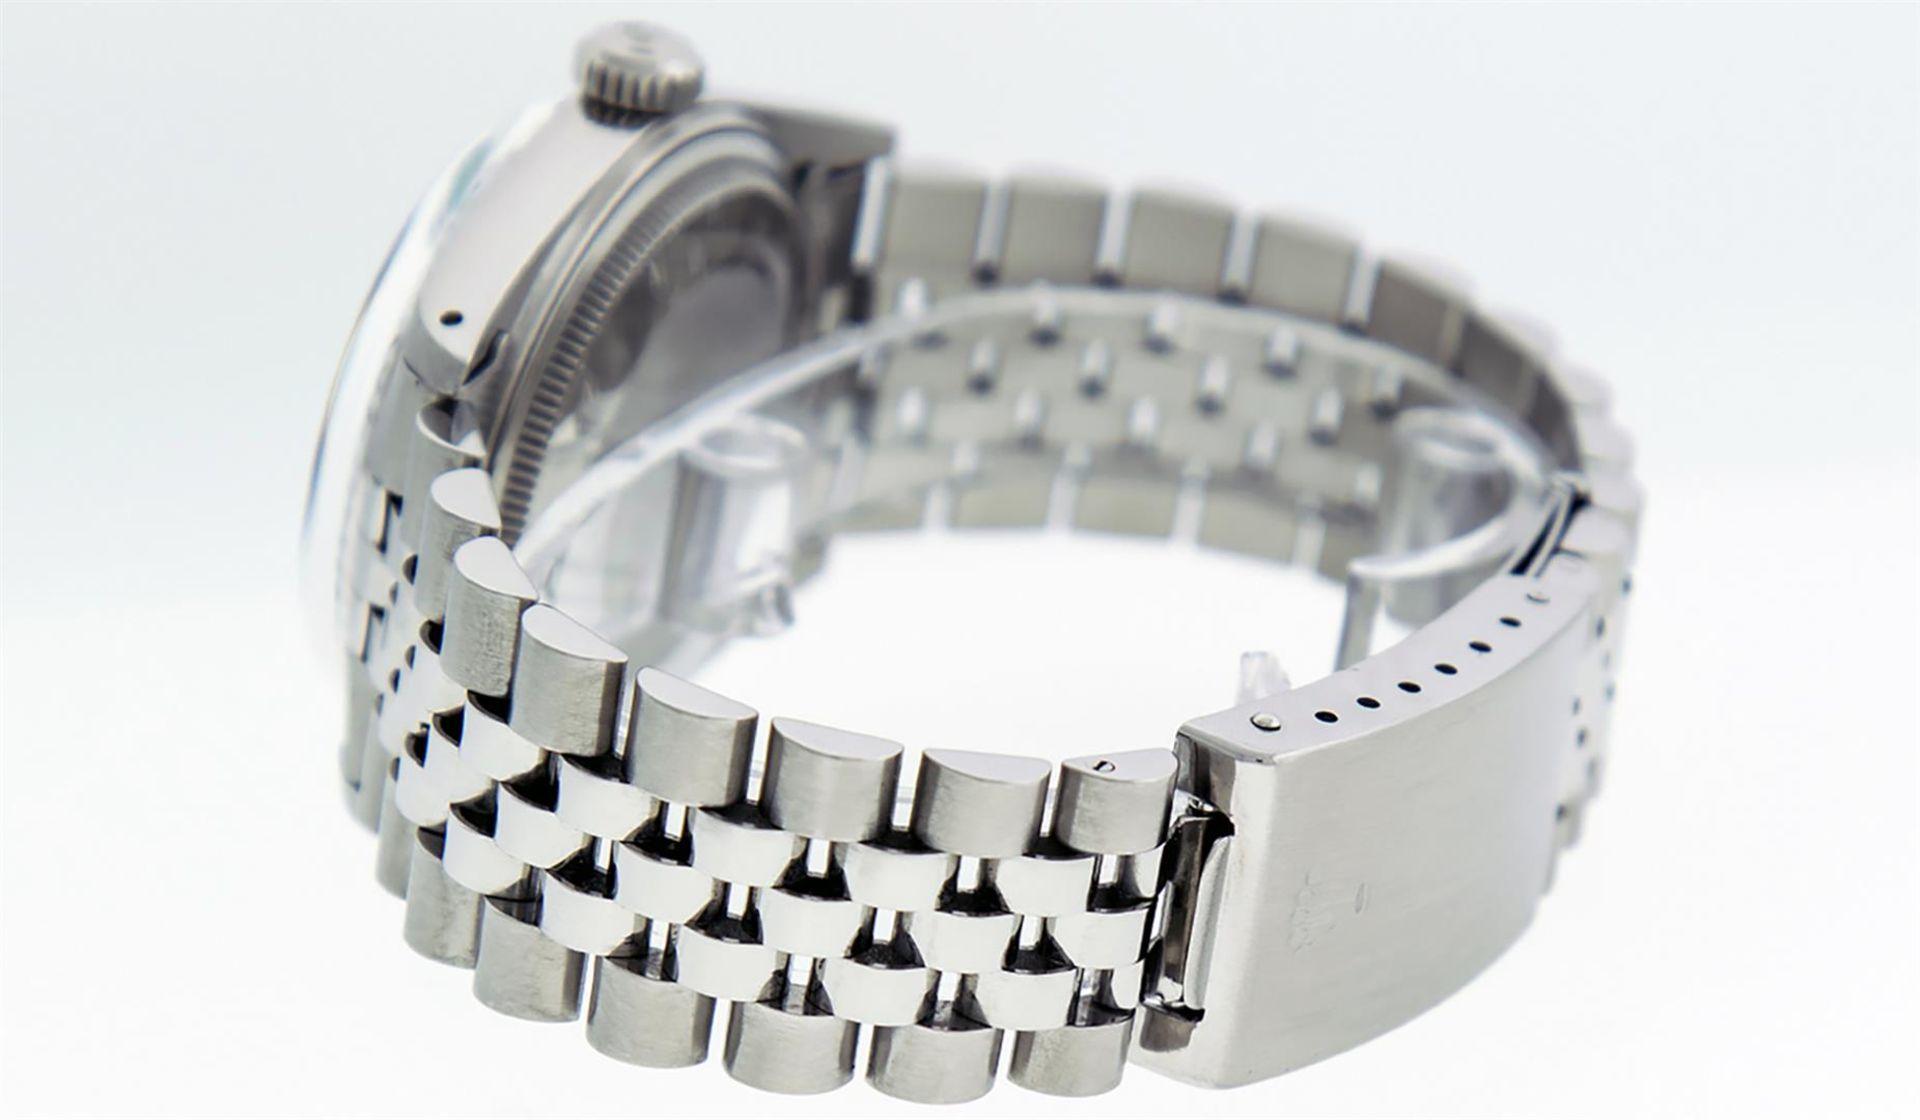 Rolex Mens Stainless Steel Ice Blue Diamond Datejust Wristwatch - Image 9 of 9